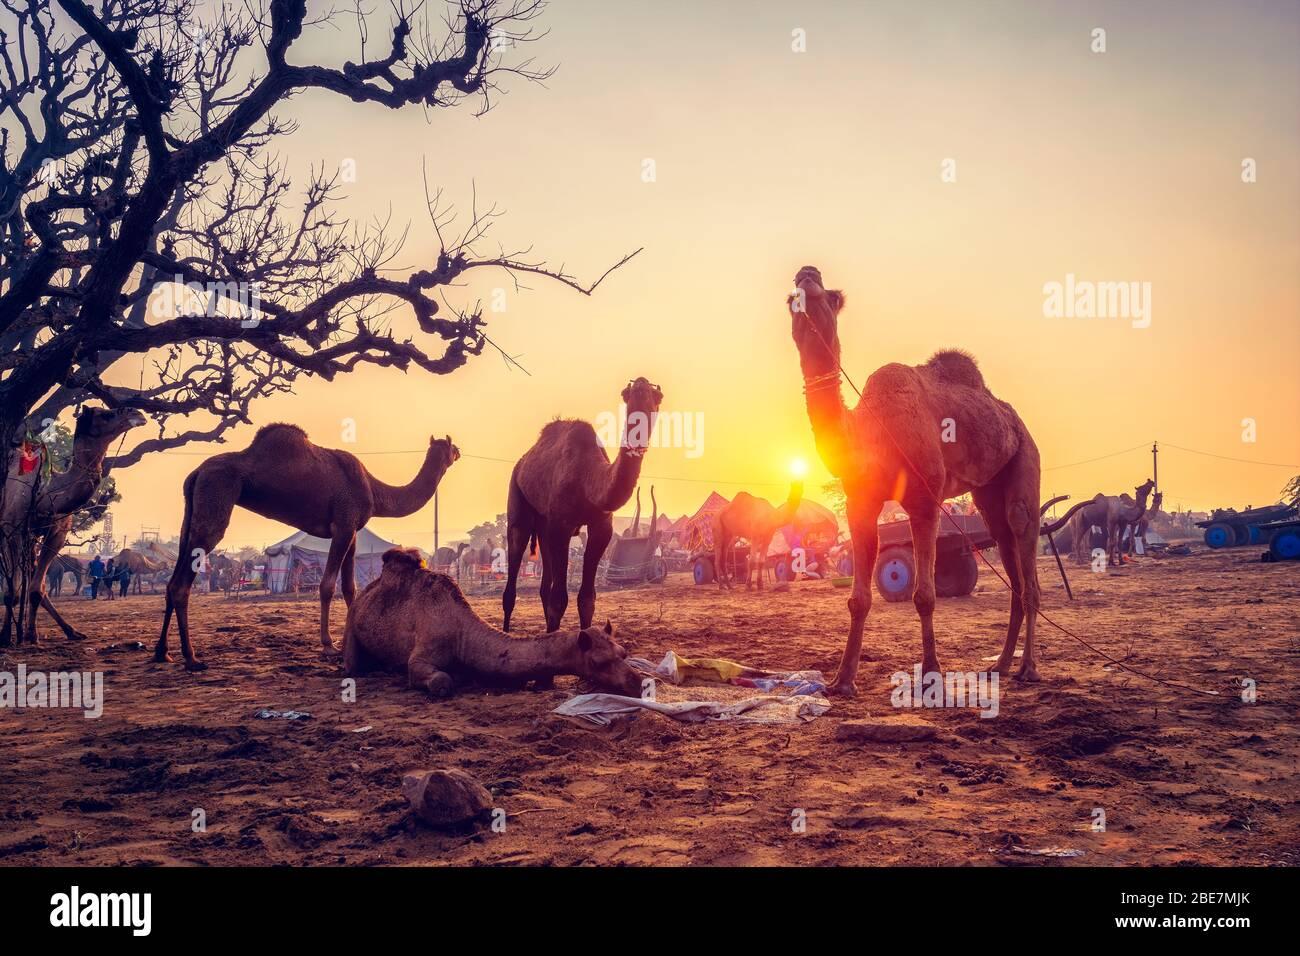 Pushkar mela cammello festival fiera in campo mangiare masticare al tramonto. Pushkar, Rajasthan, India Foto Stock